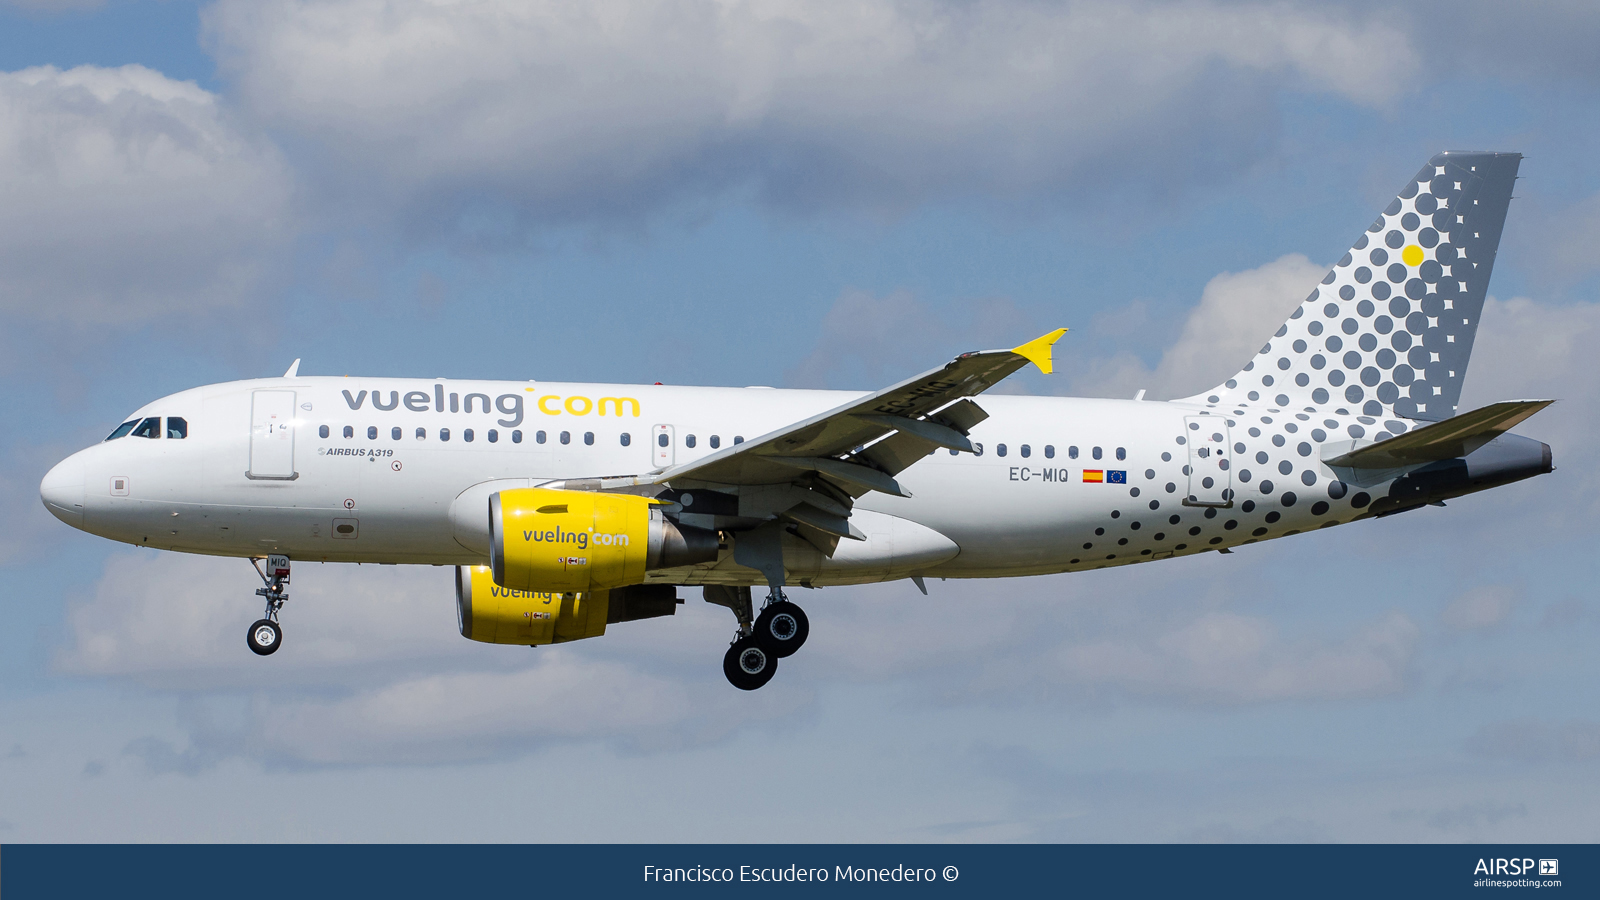 VuelingAirbus A319EC-MIQ